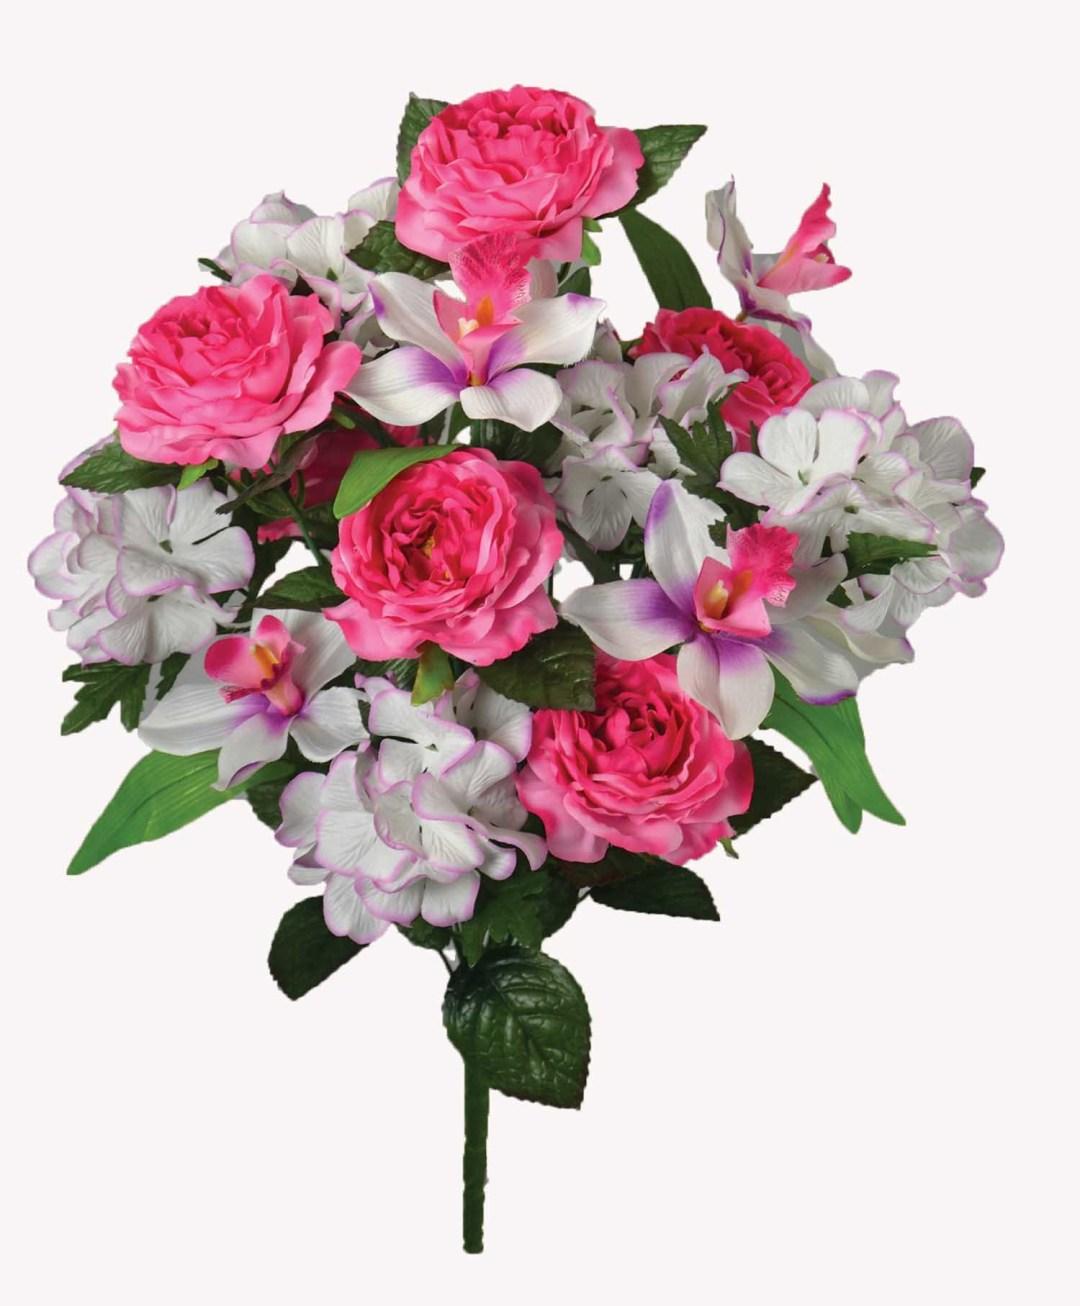 "SB3501PK - 21"" Large Rose/Hydrangea Orchid Bush x 18 $8.95 SB3501PK"